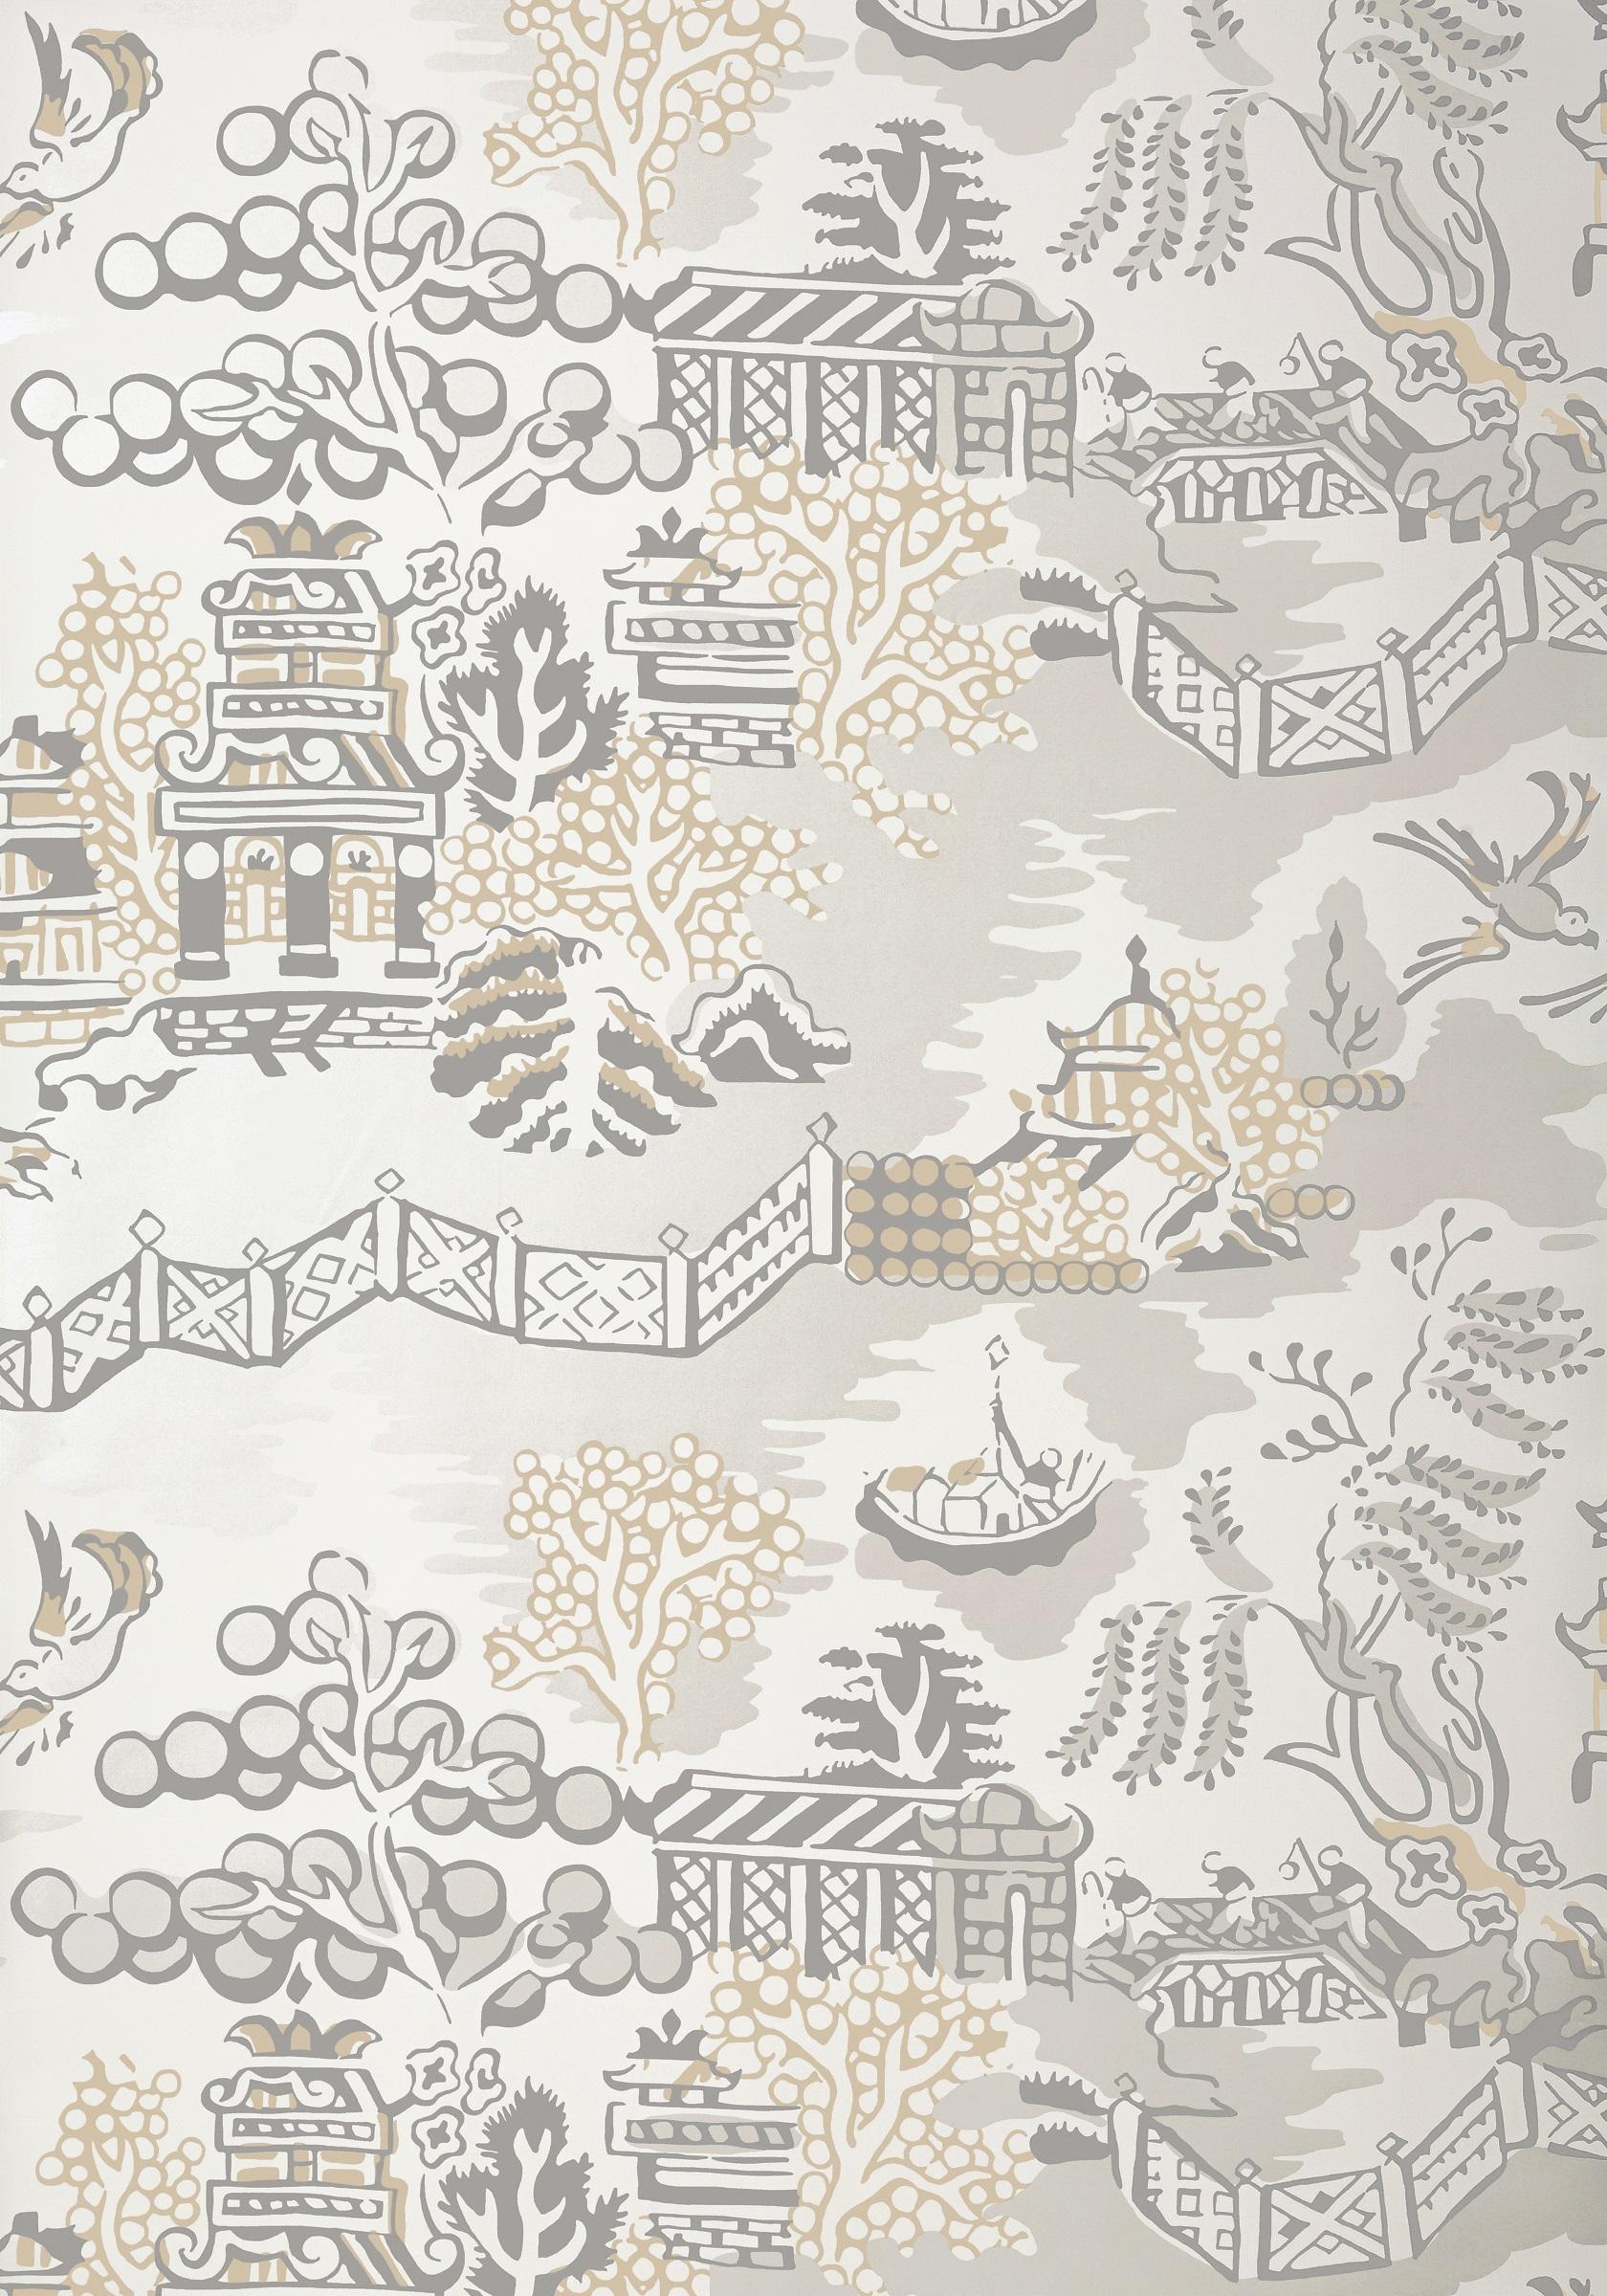 Wallpaper Thibaut Wallpapers Enchantment Wallpapers Thibaut 1680x2400